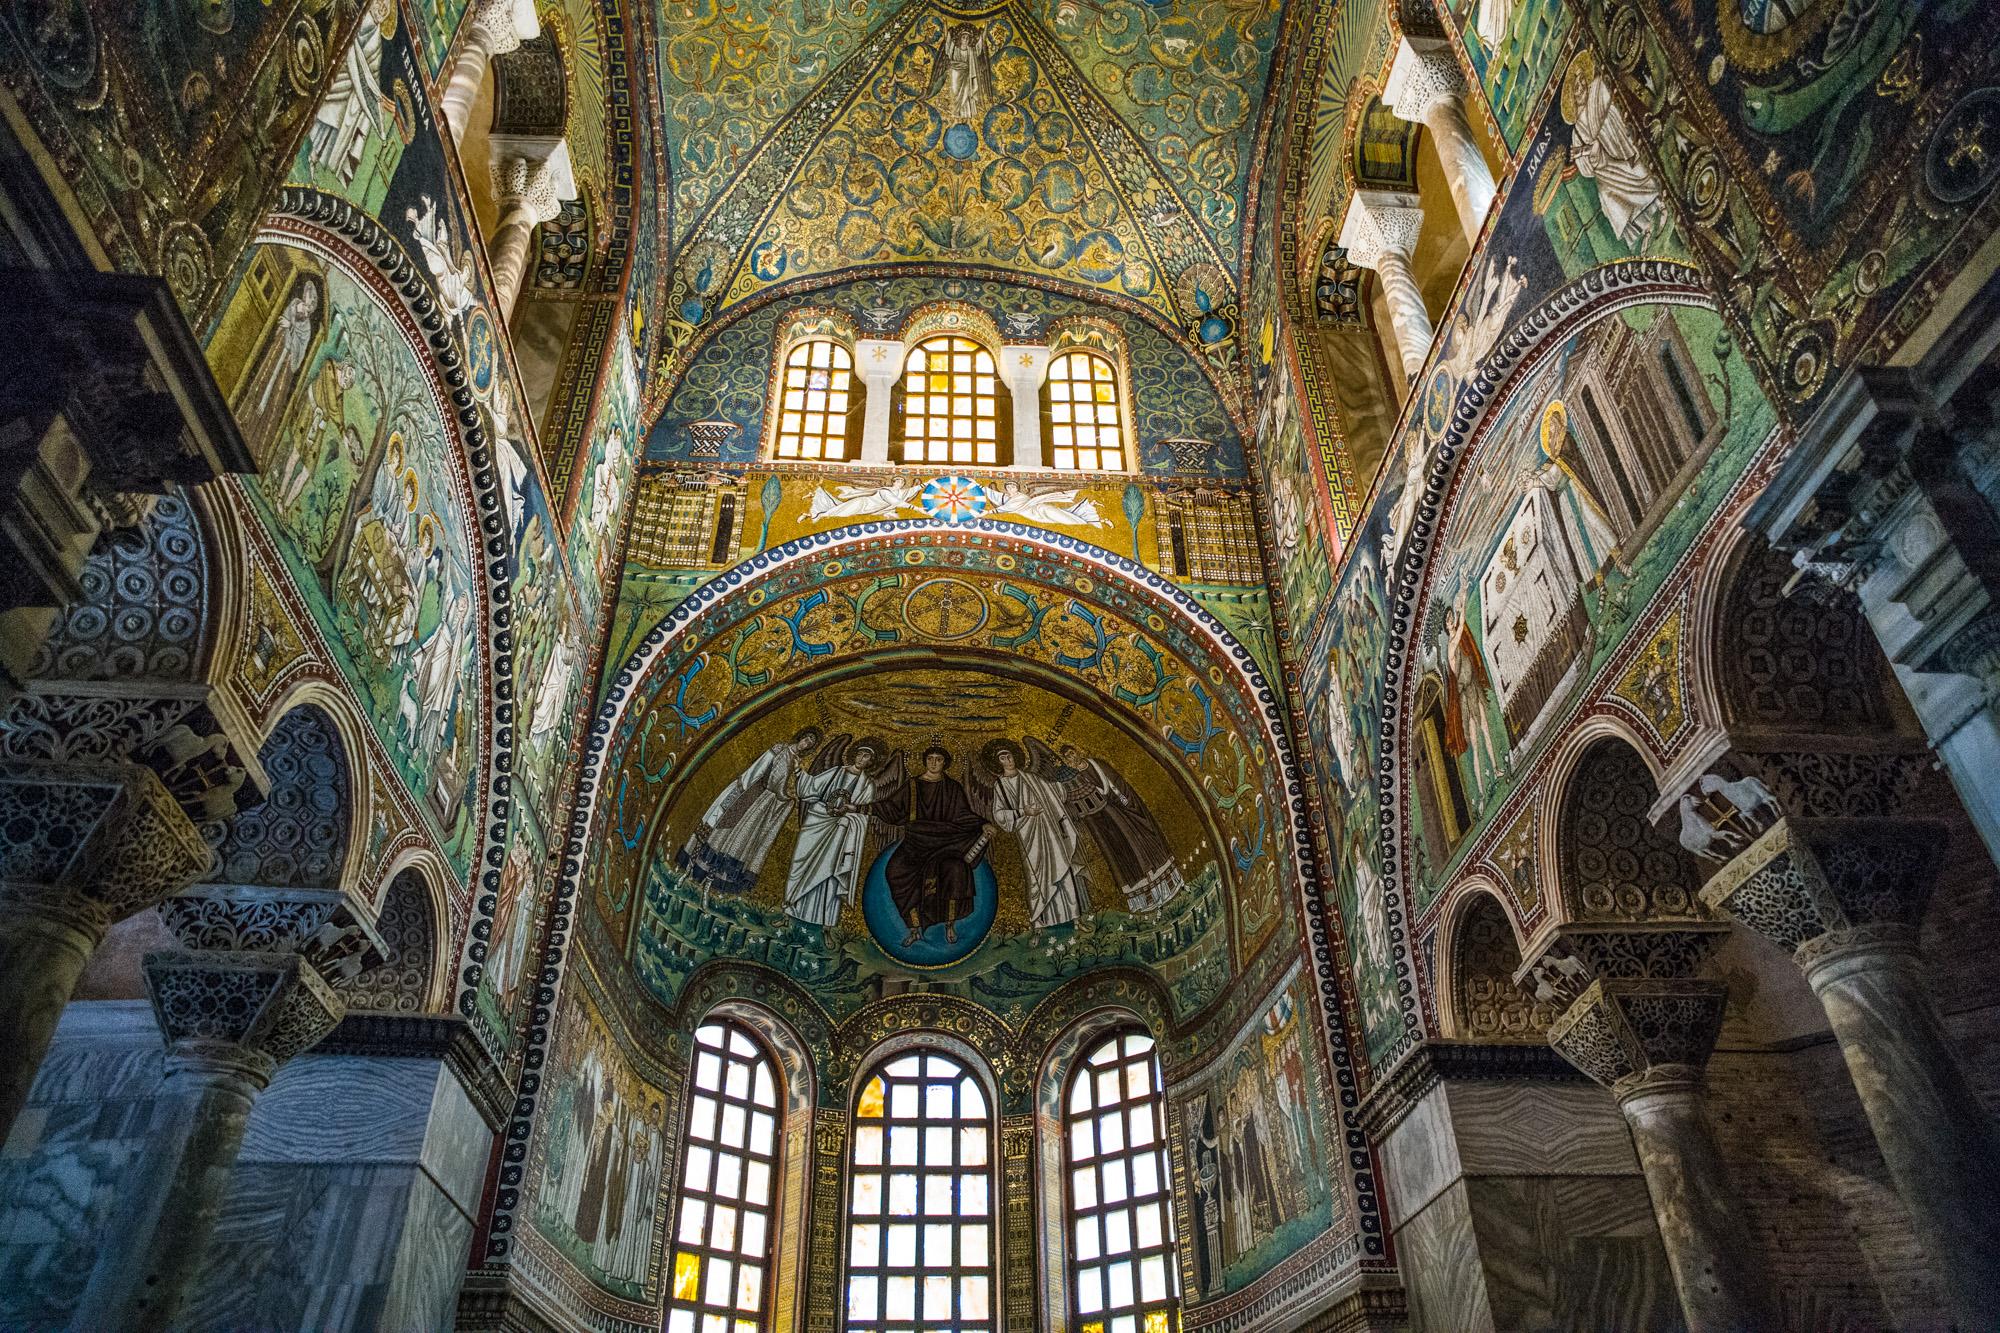 The Mosaics in the church of San Vitale